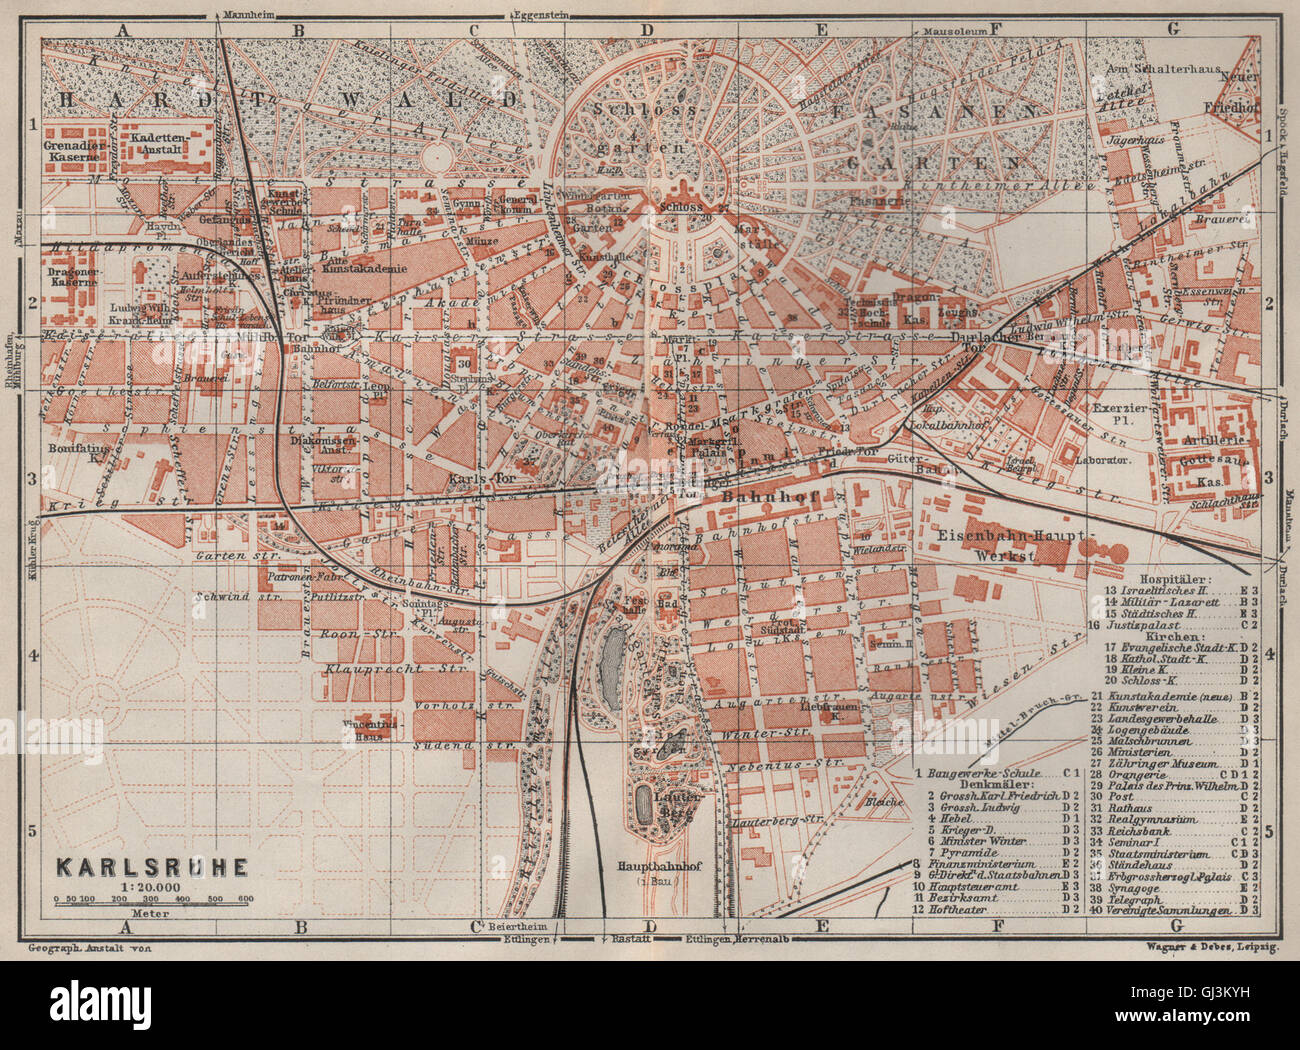 Karte Karlsruhe.Karlsruhe Antique Town City Stadtplan Baden Württemberg Karte 1906